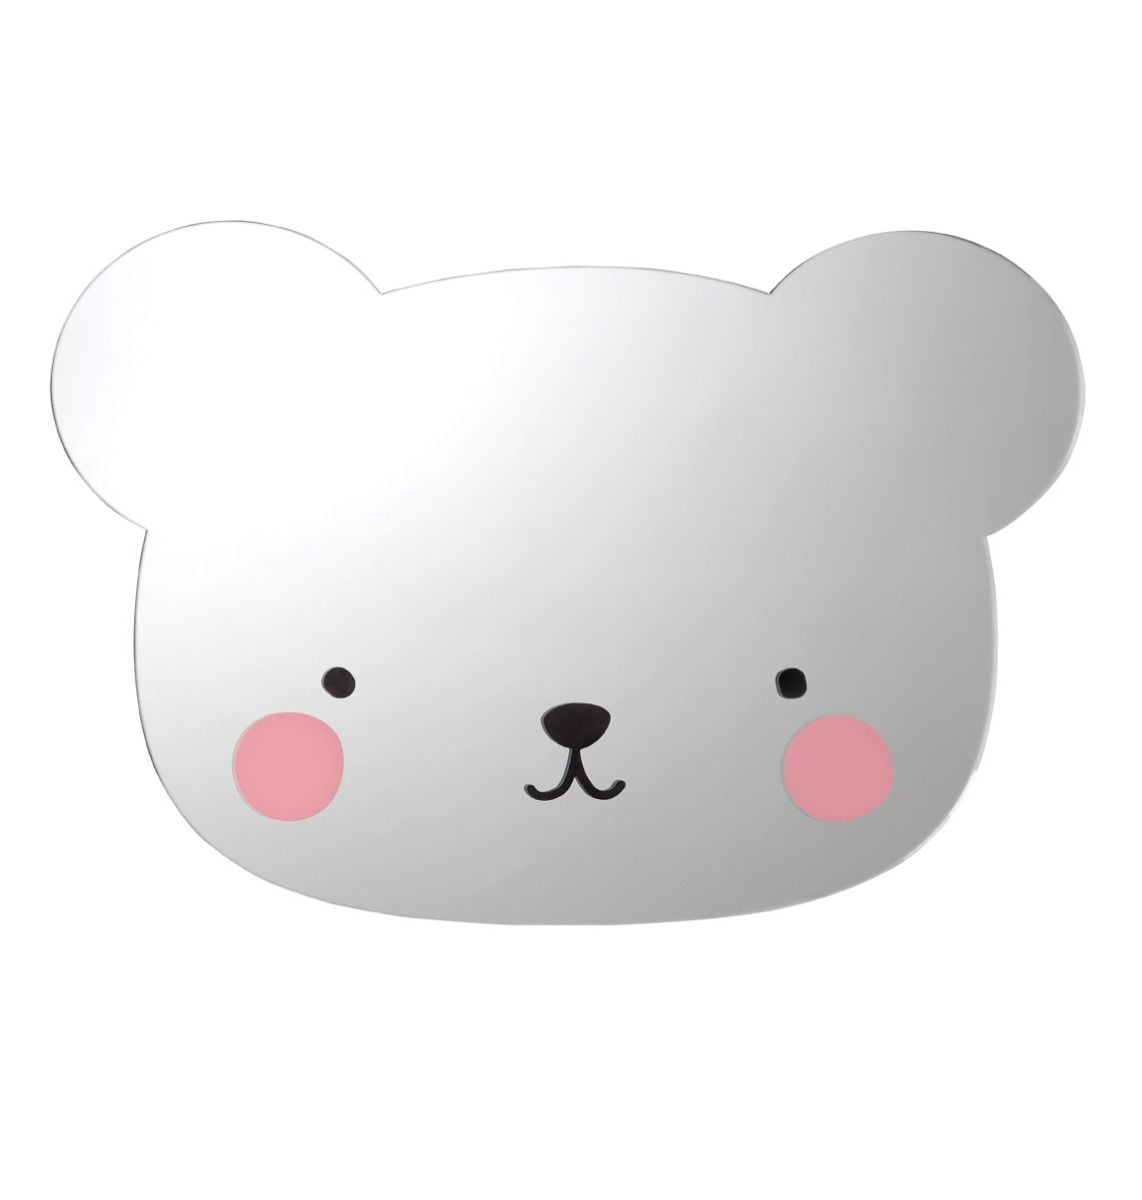 zrkadlo-panda-dadaboom-sk-1